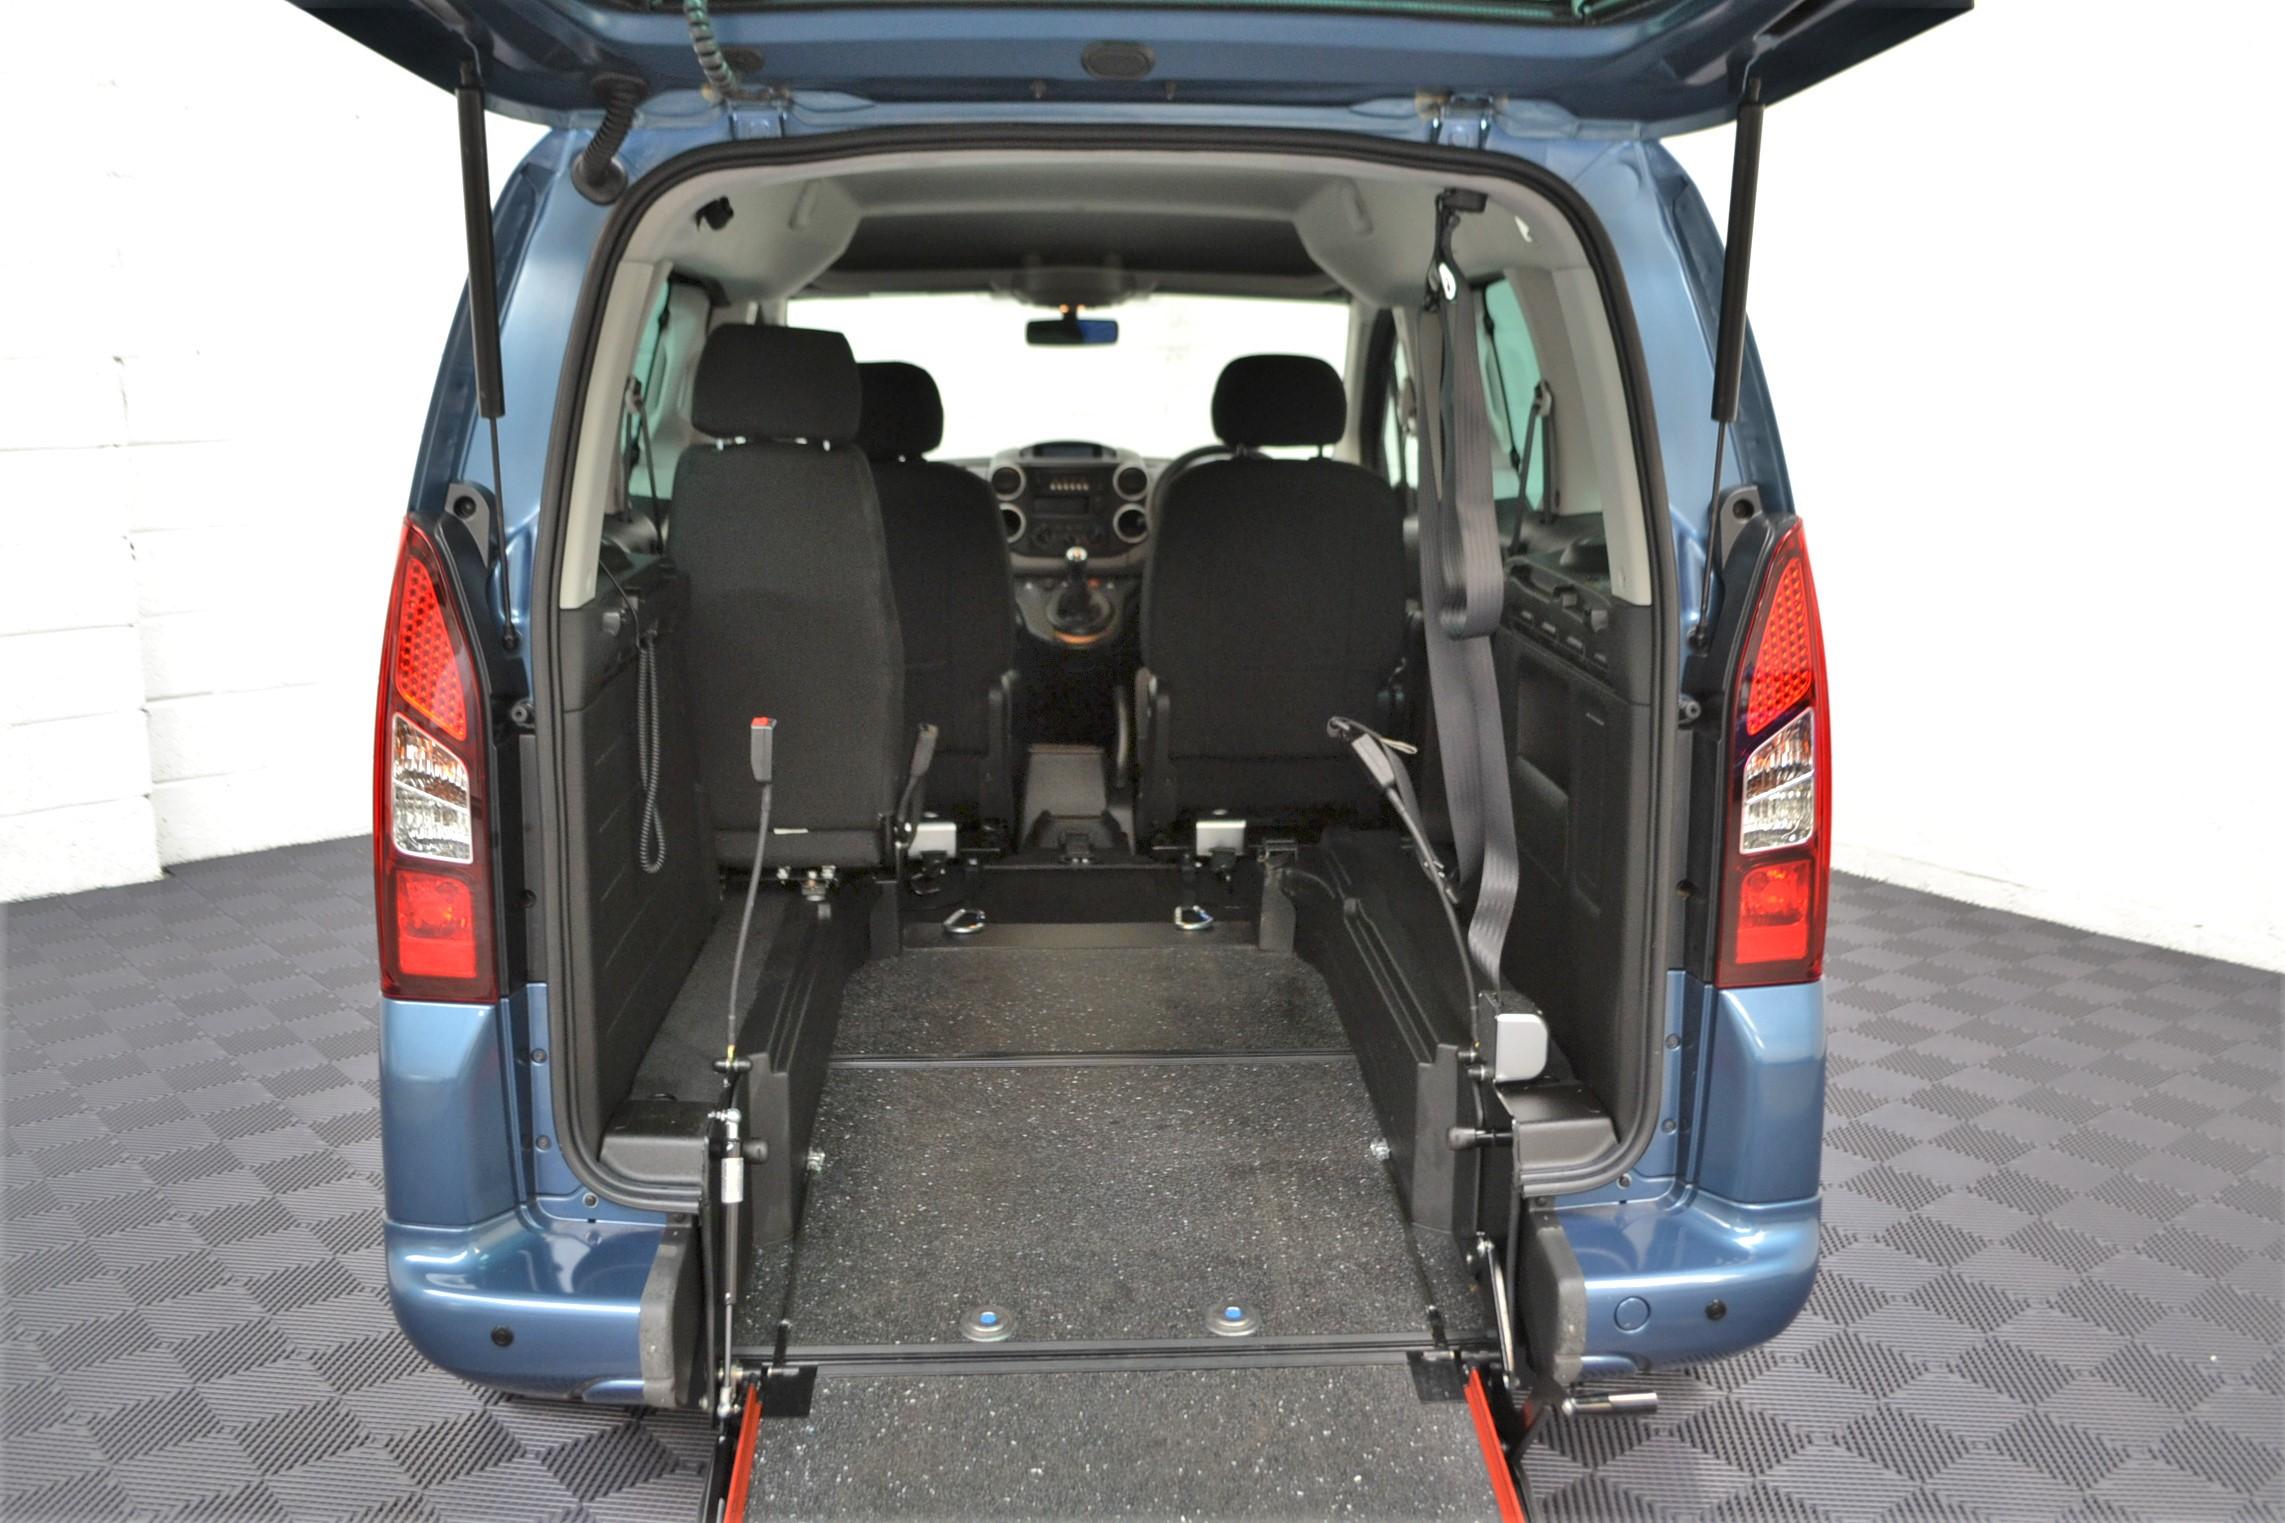 WAV Cars For Sale Bristol Wheelchair Accessible Vehicles Used For Sale Somerset Devon Dorset Bath Peugeot Partner SF67 EEA 5